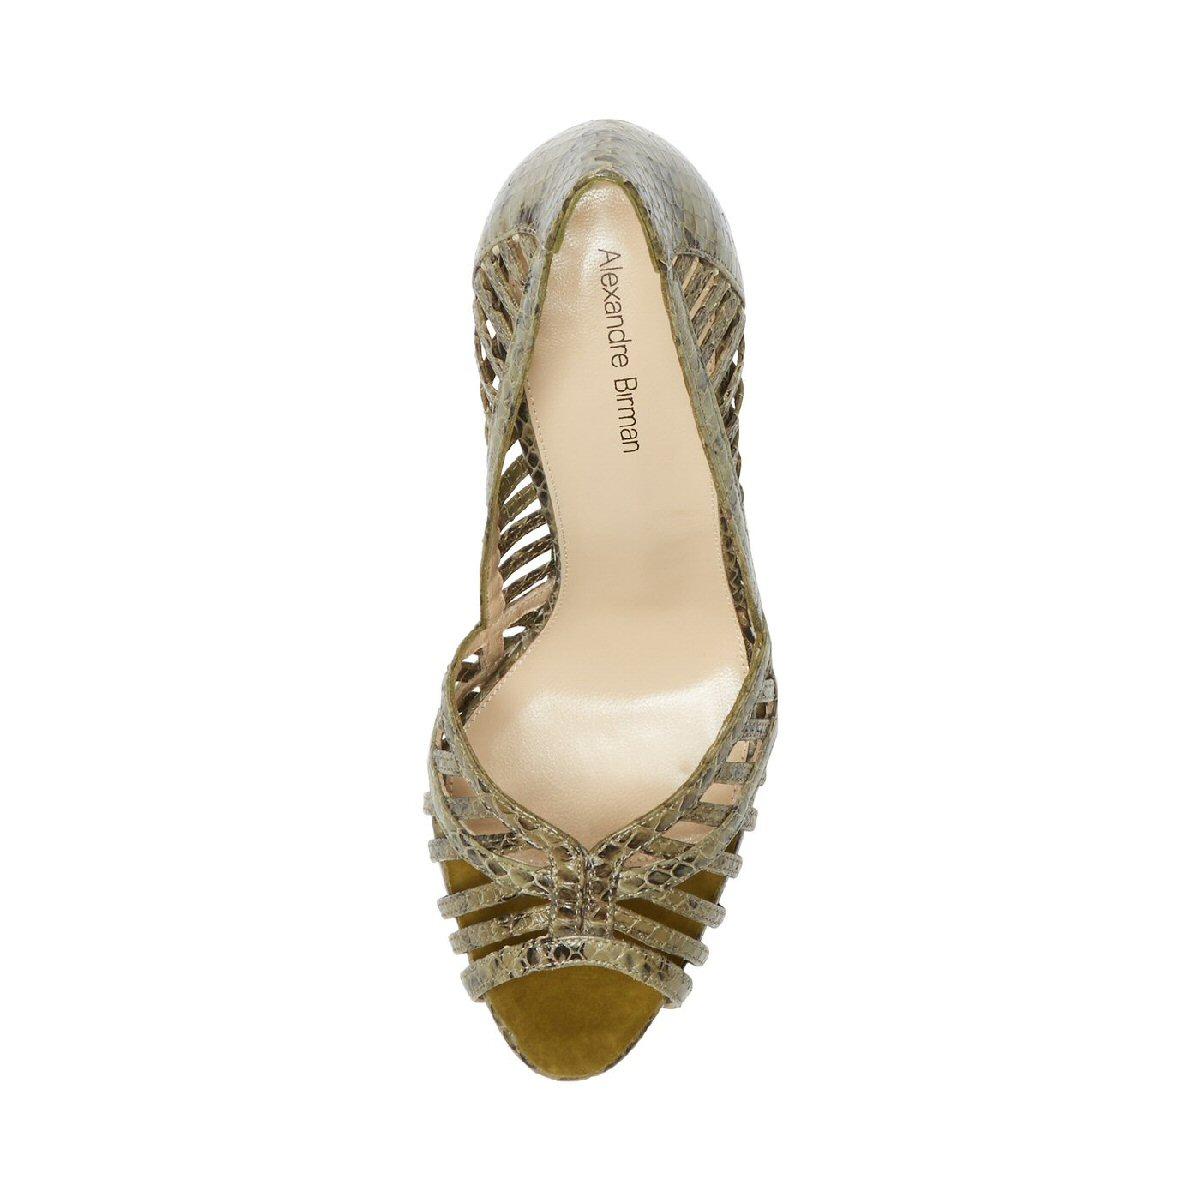 Birman Snakeskin Sandals-05